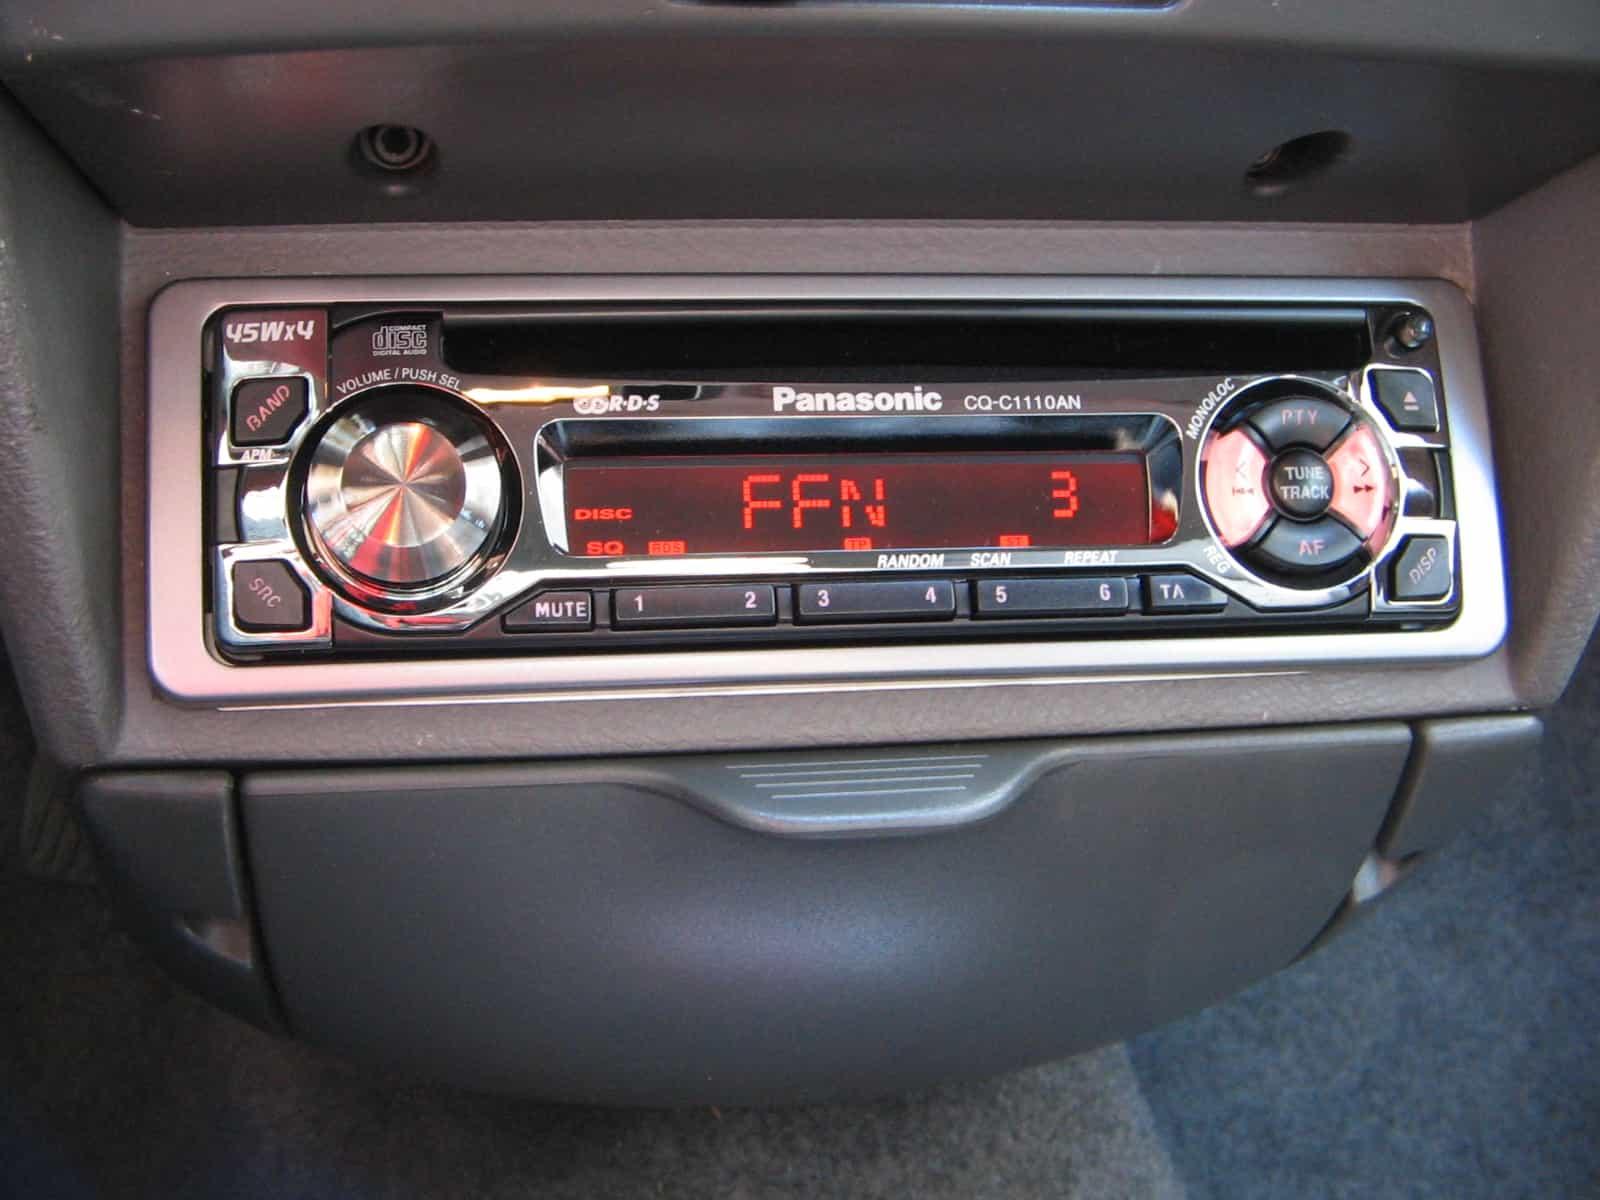 90s car audio systems